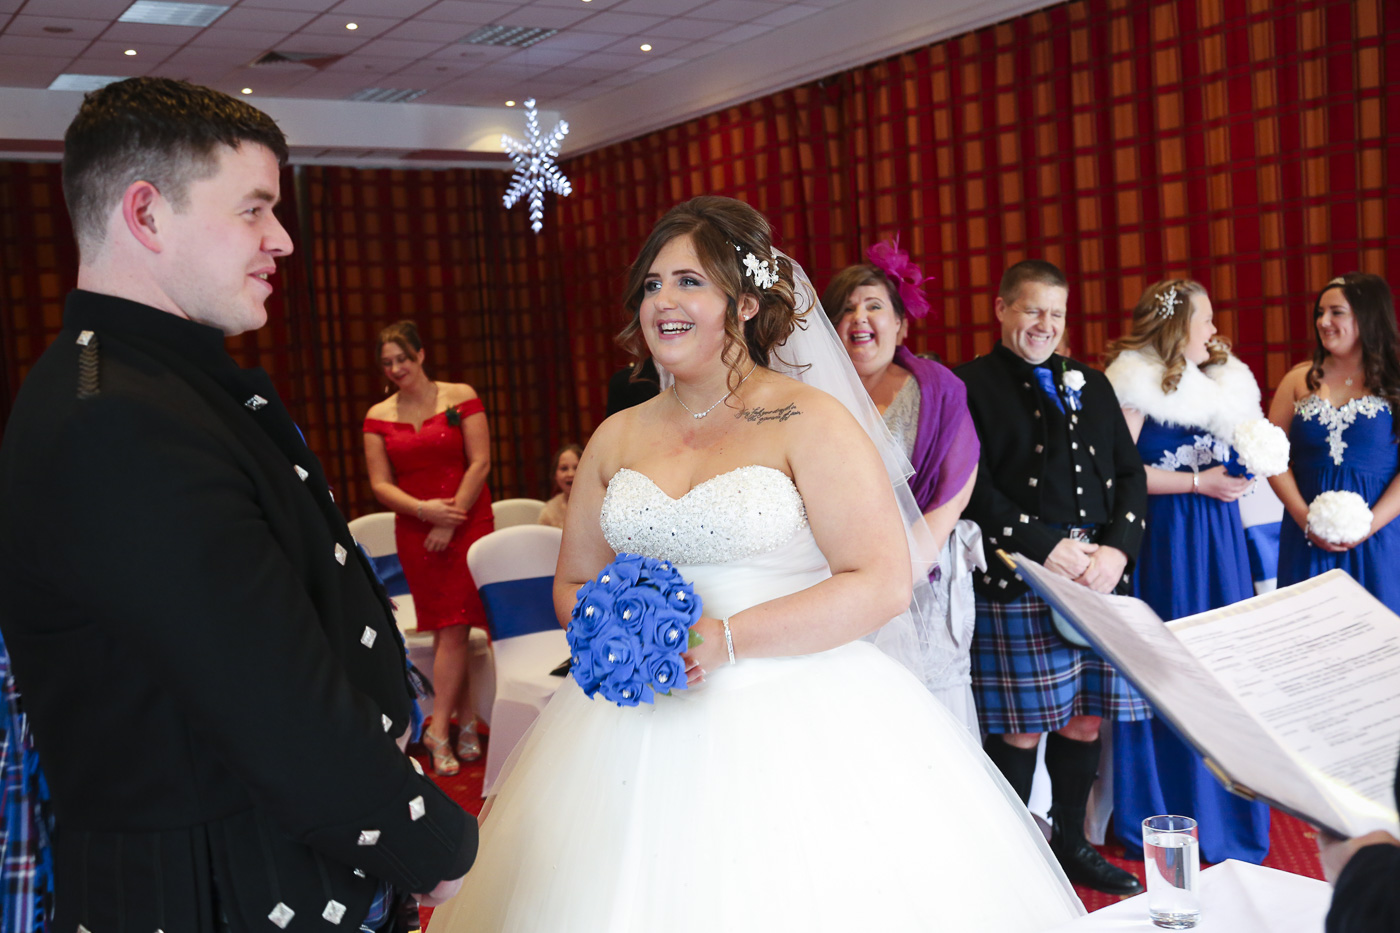 wedding-photography-at-the-hilton-coylumbridge-aviemore-7820